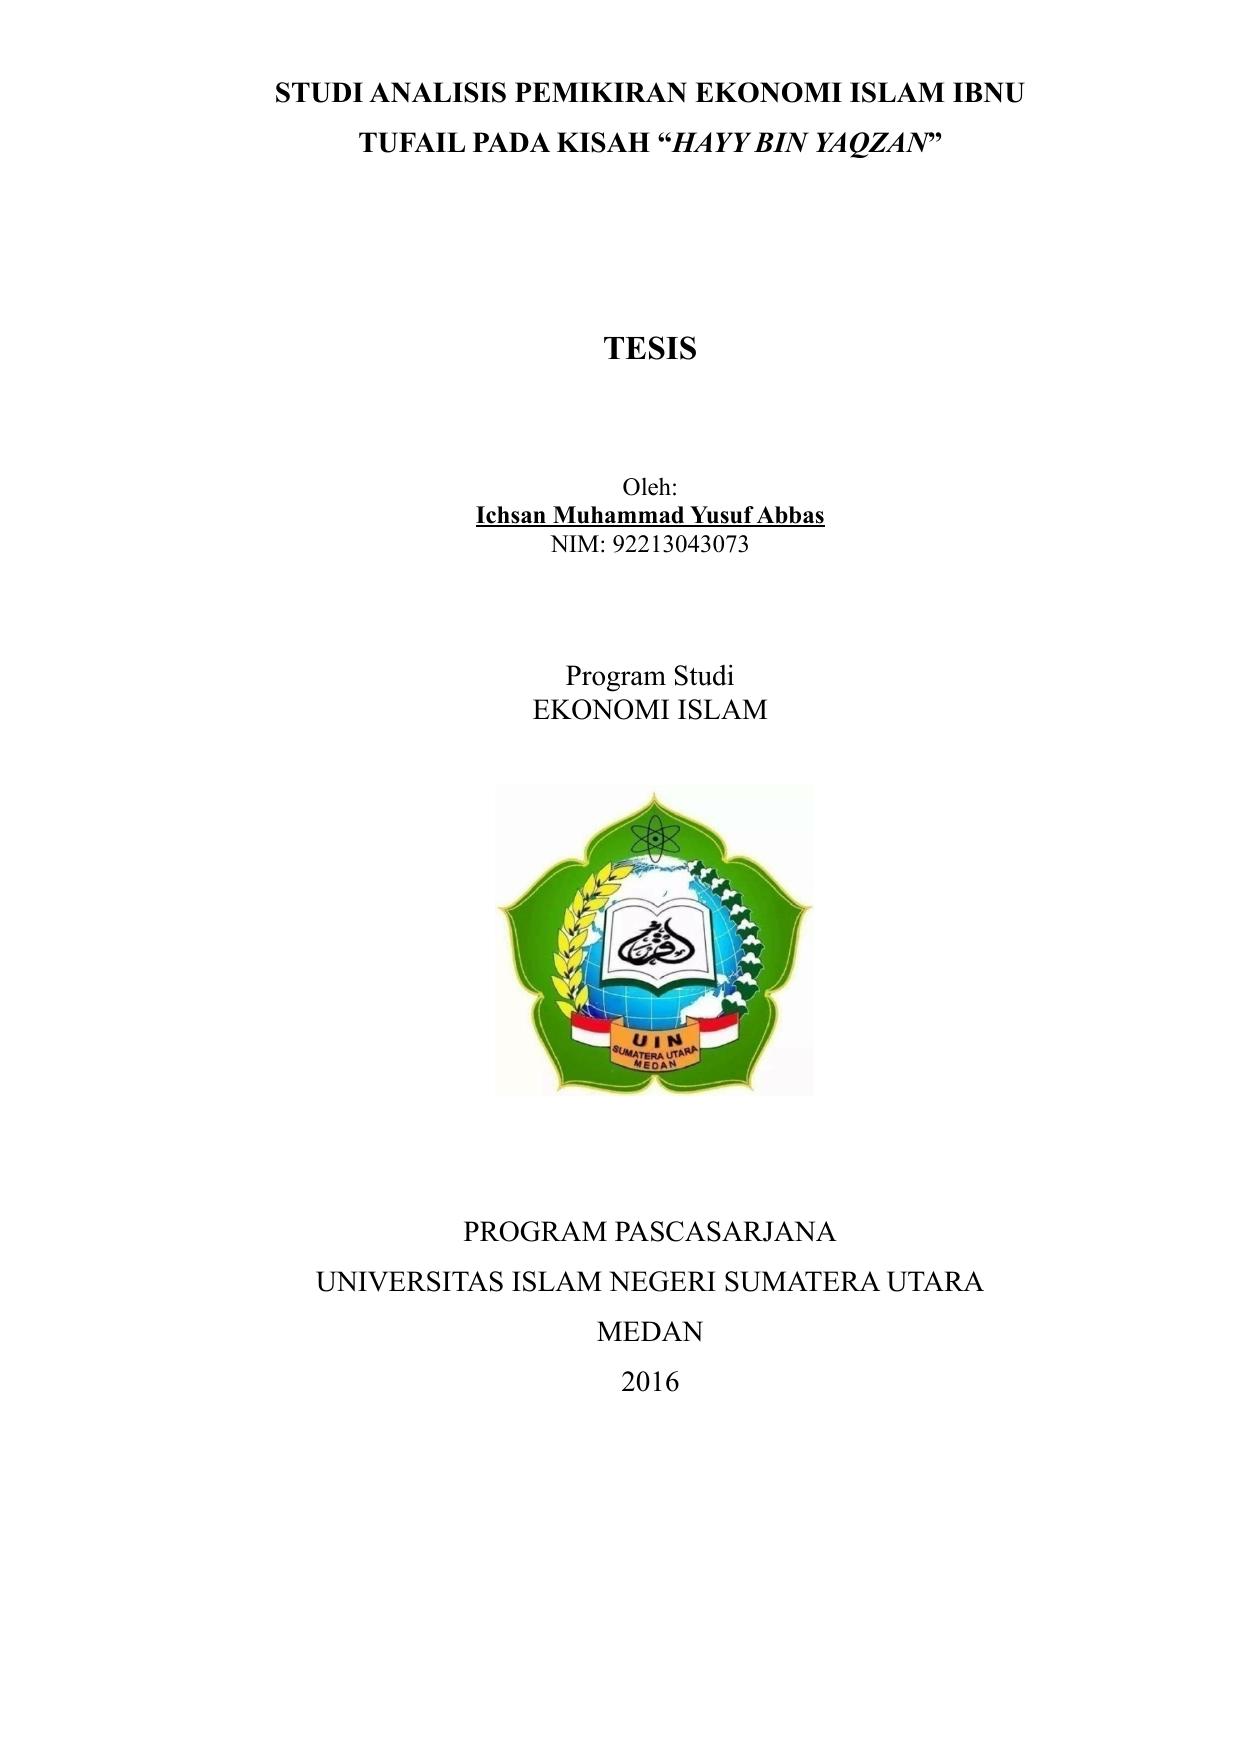 HAYY BIN YAQZAN Repository UIN Sumatera Utara